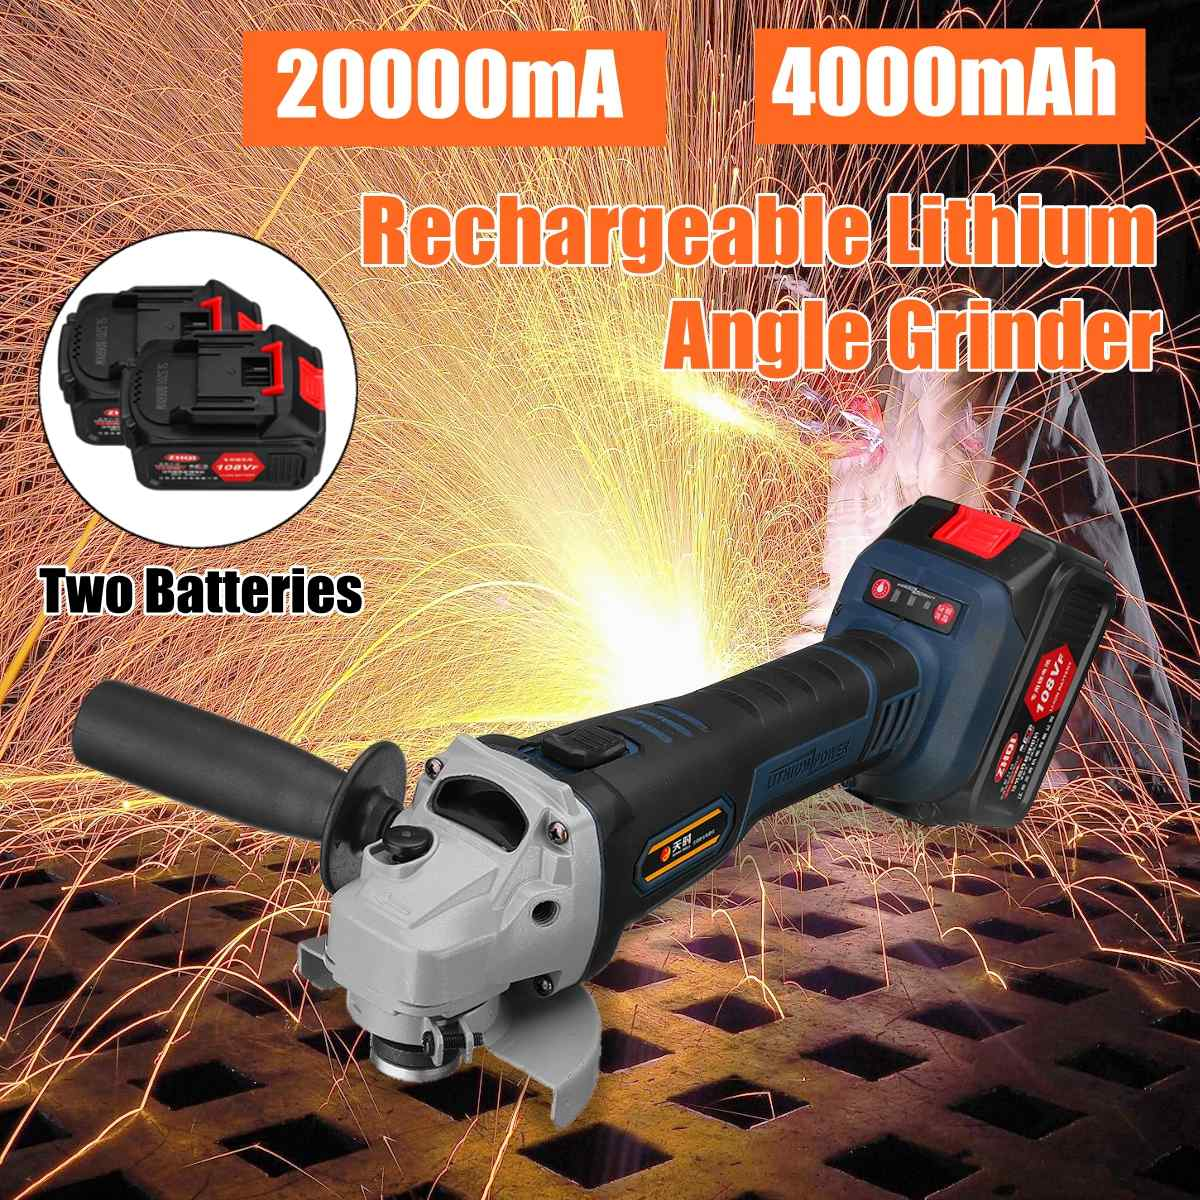 110V~220V 108VF 4000mah 20000mA Cordless Electric Angle Grinder Polisher Machine + 2pcs 18V Battery